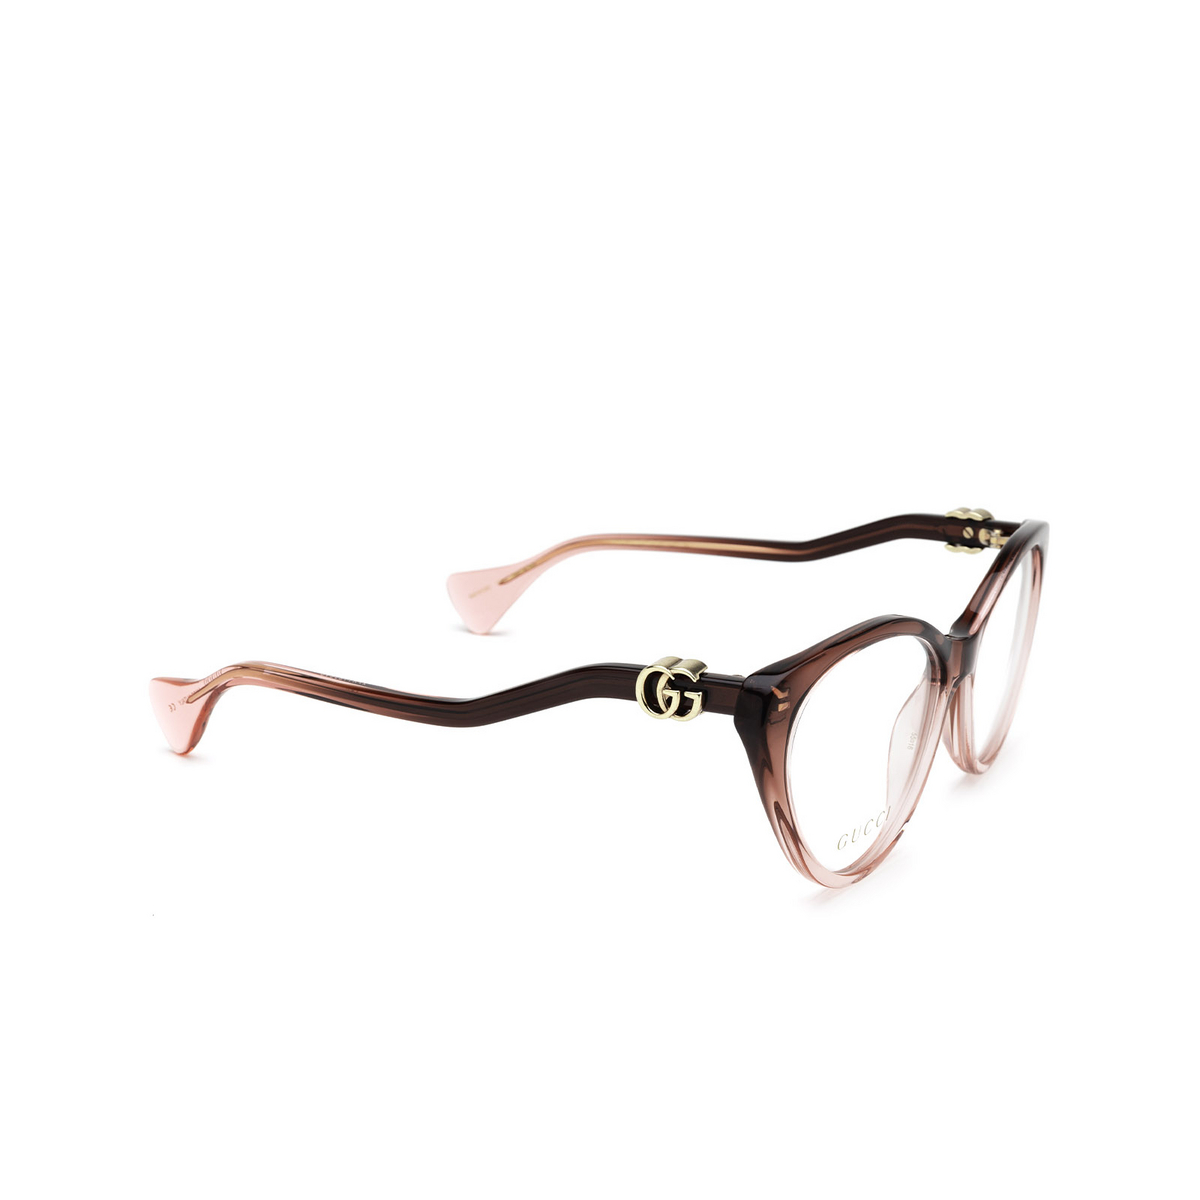 Gucci® Cat-eye Eyeglasses: GG1013O color Burgundy & Pink 003 - three-quarters view.